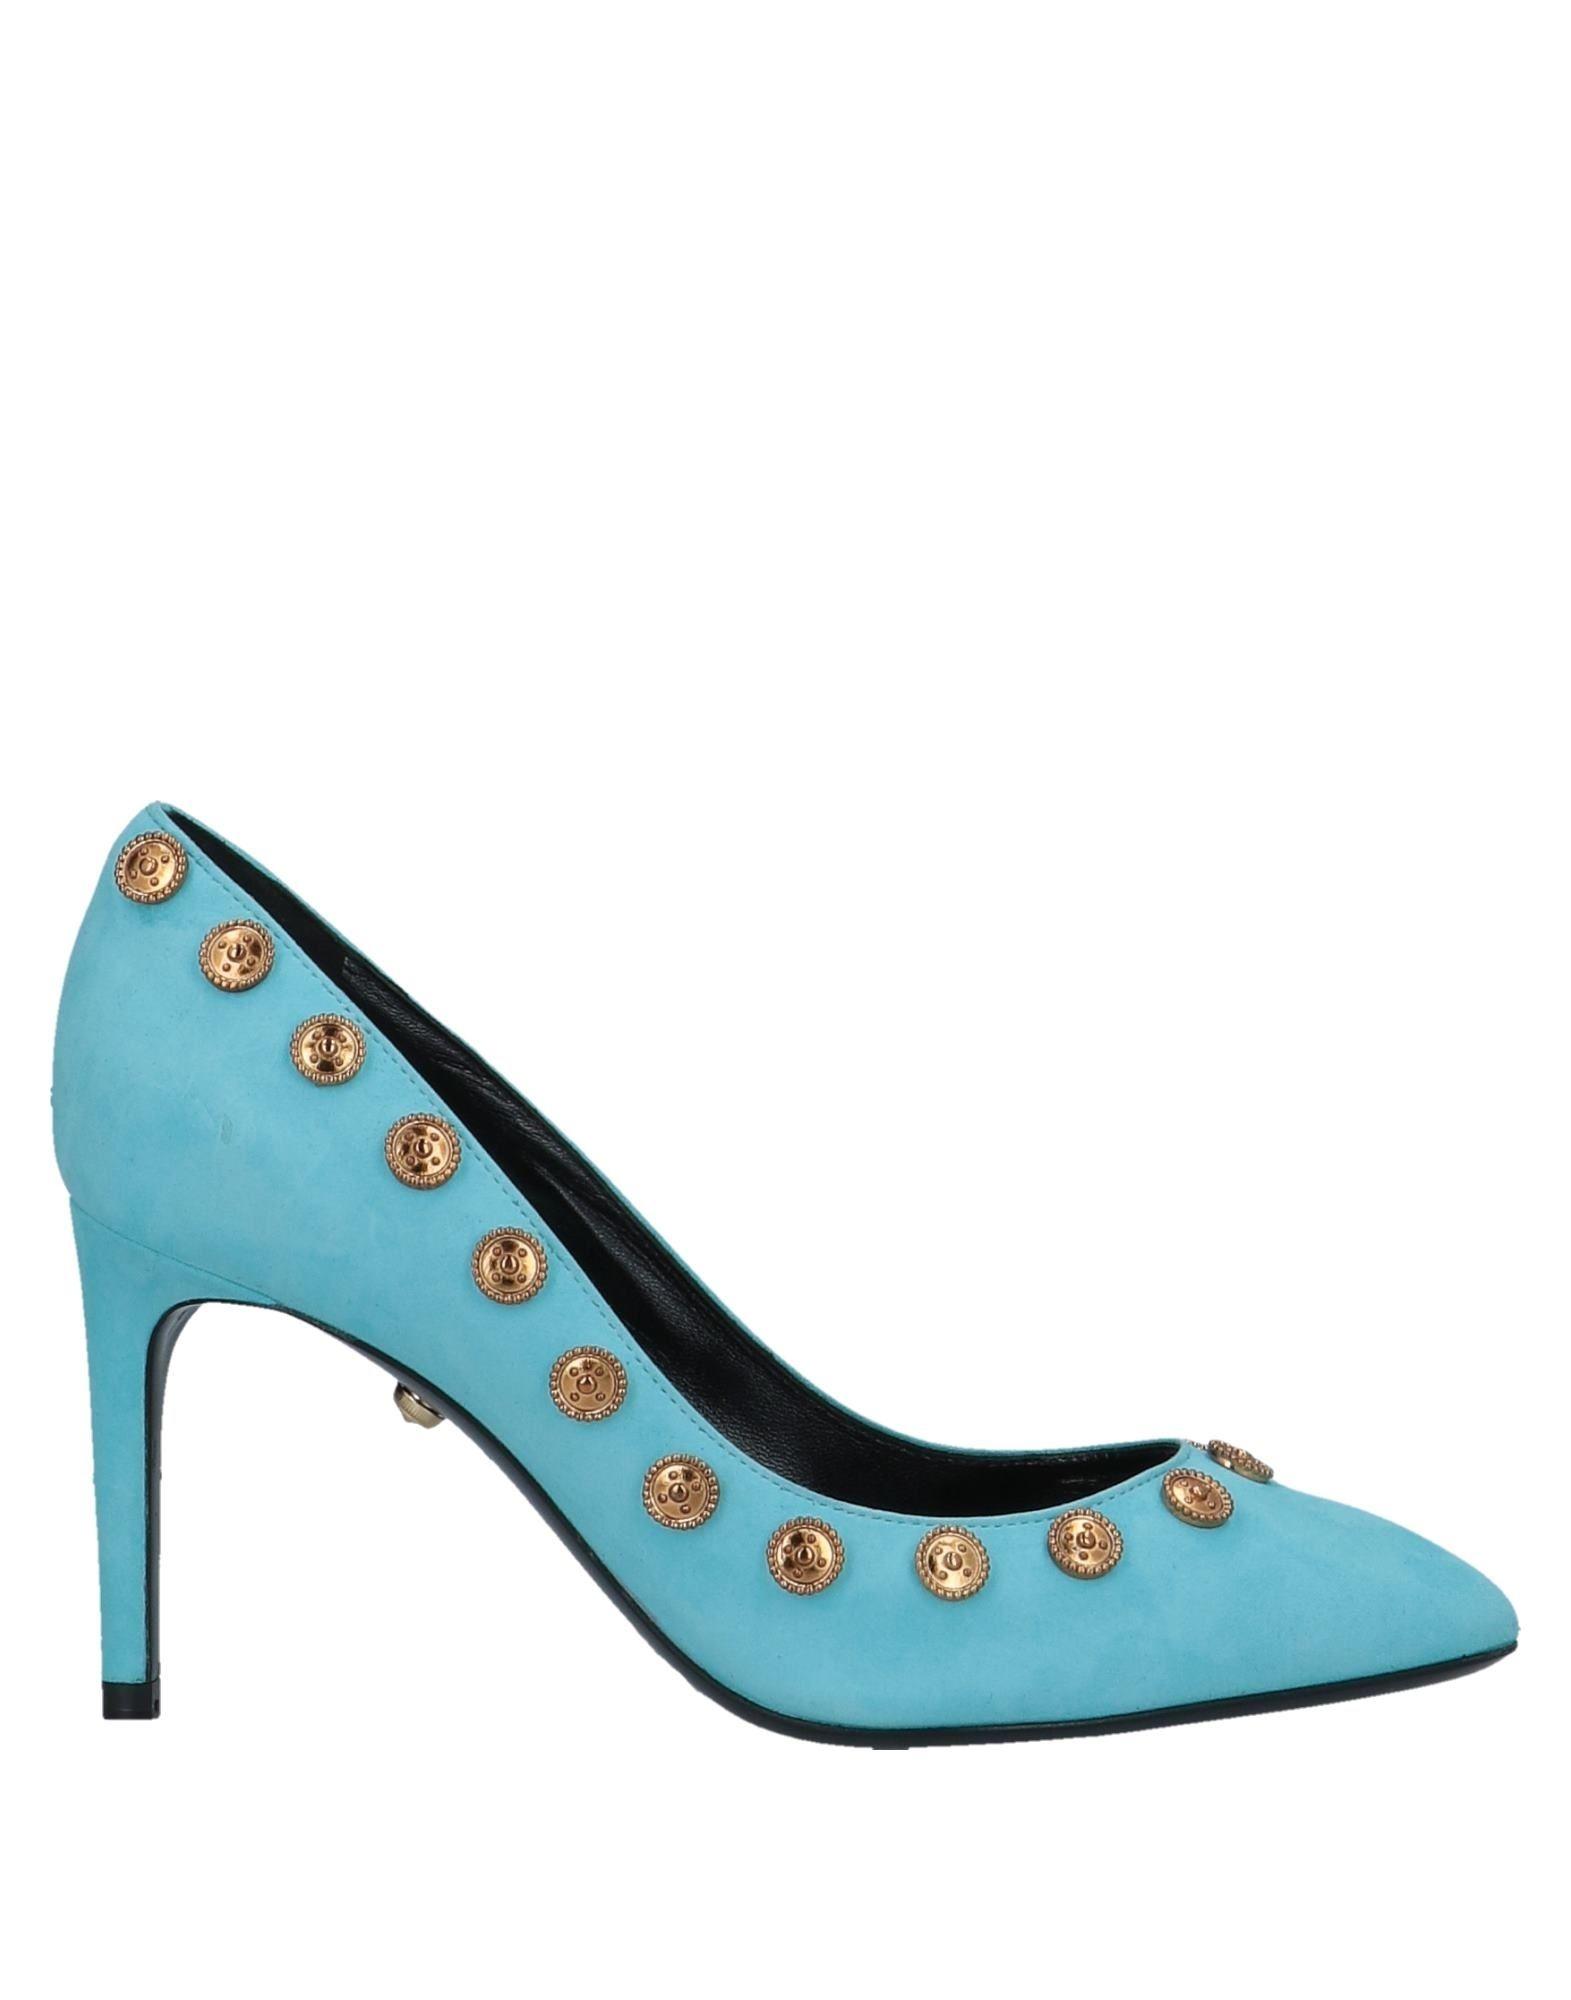 Zapatos casuales salvajes Zapato De Salón Fausto Puglisi Mujer - Azul Salones Fausto Puglisi  Azul - celeste f210d5